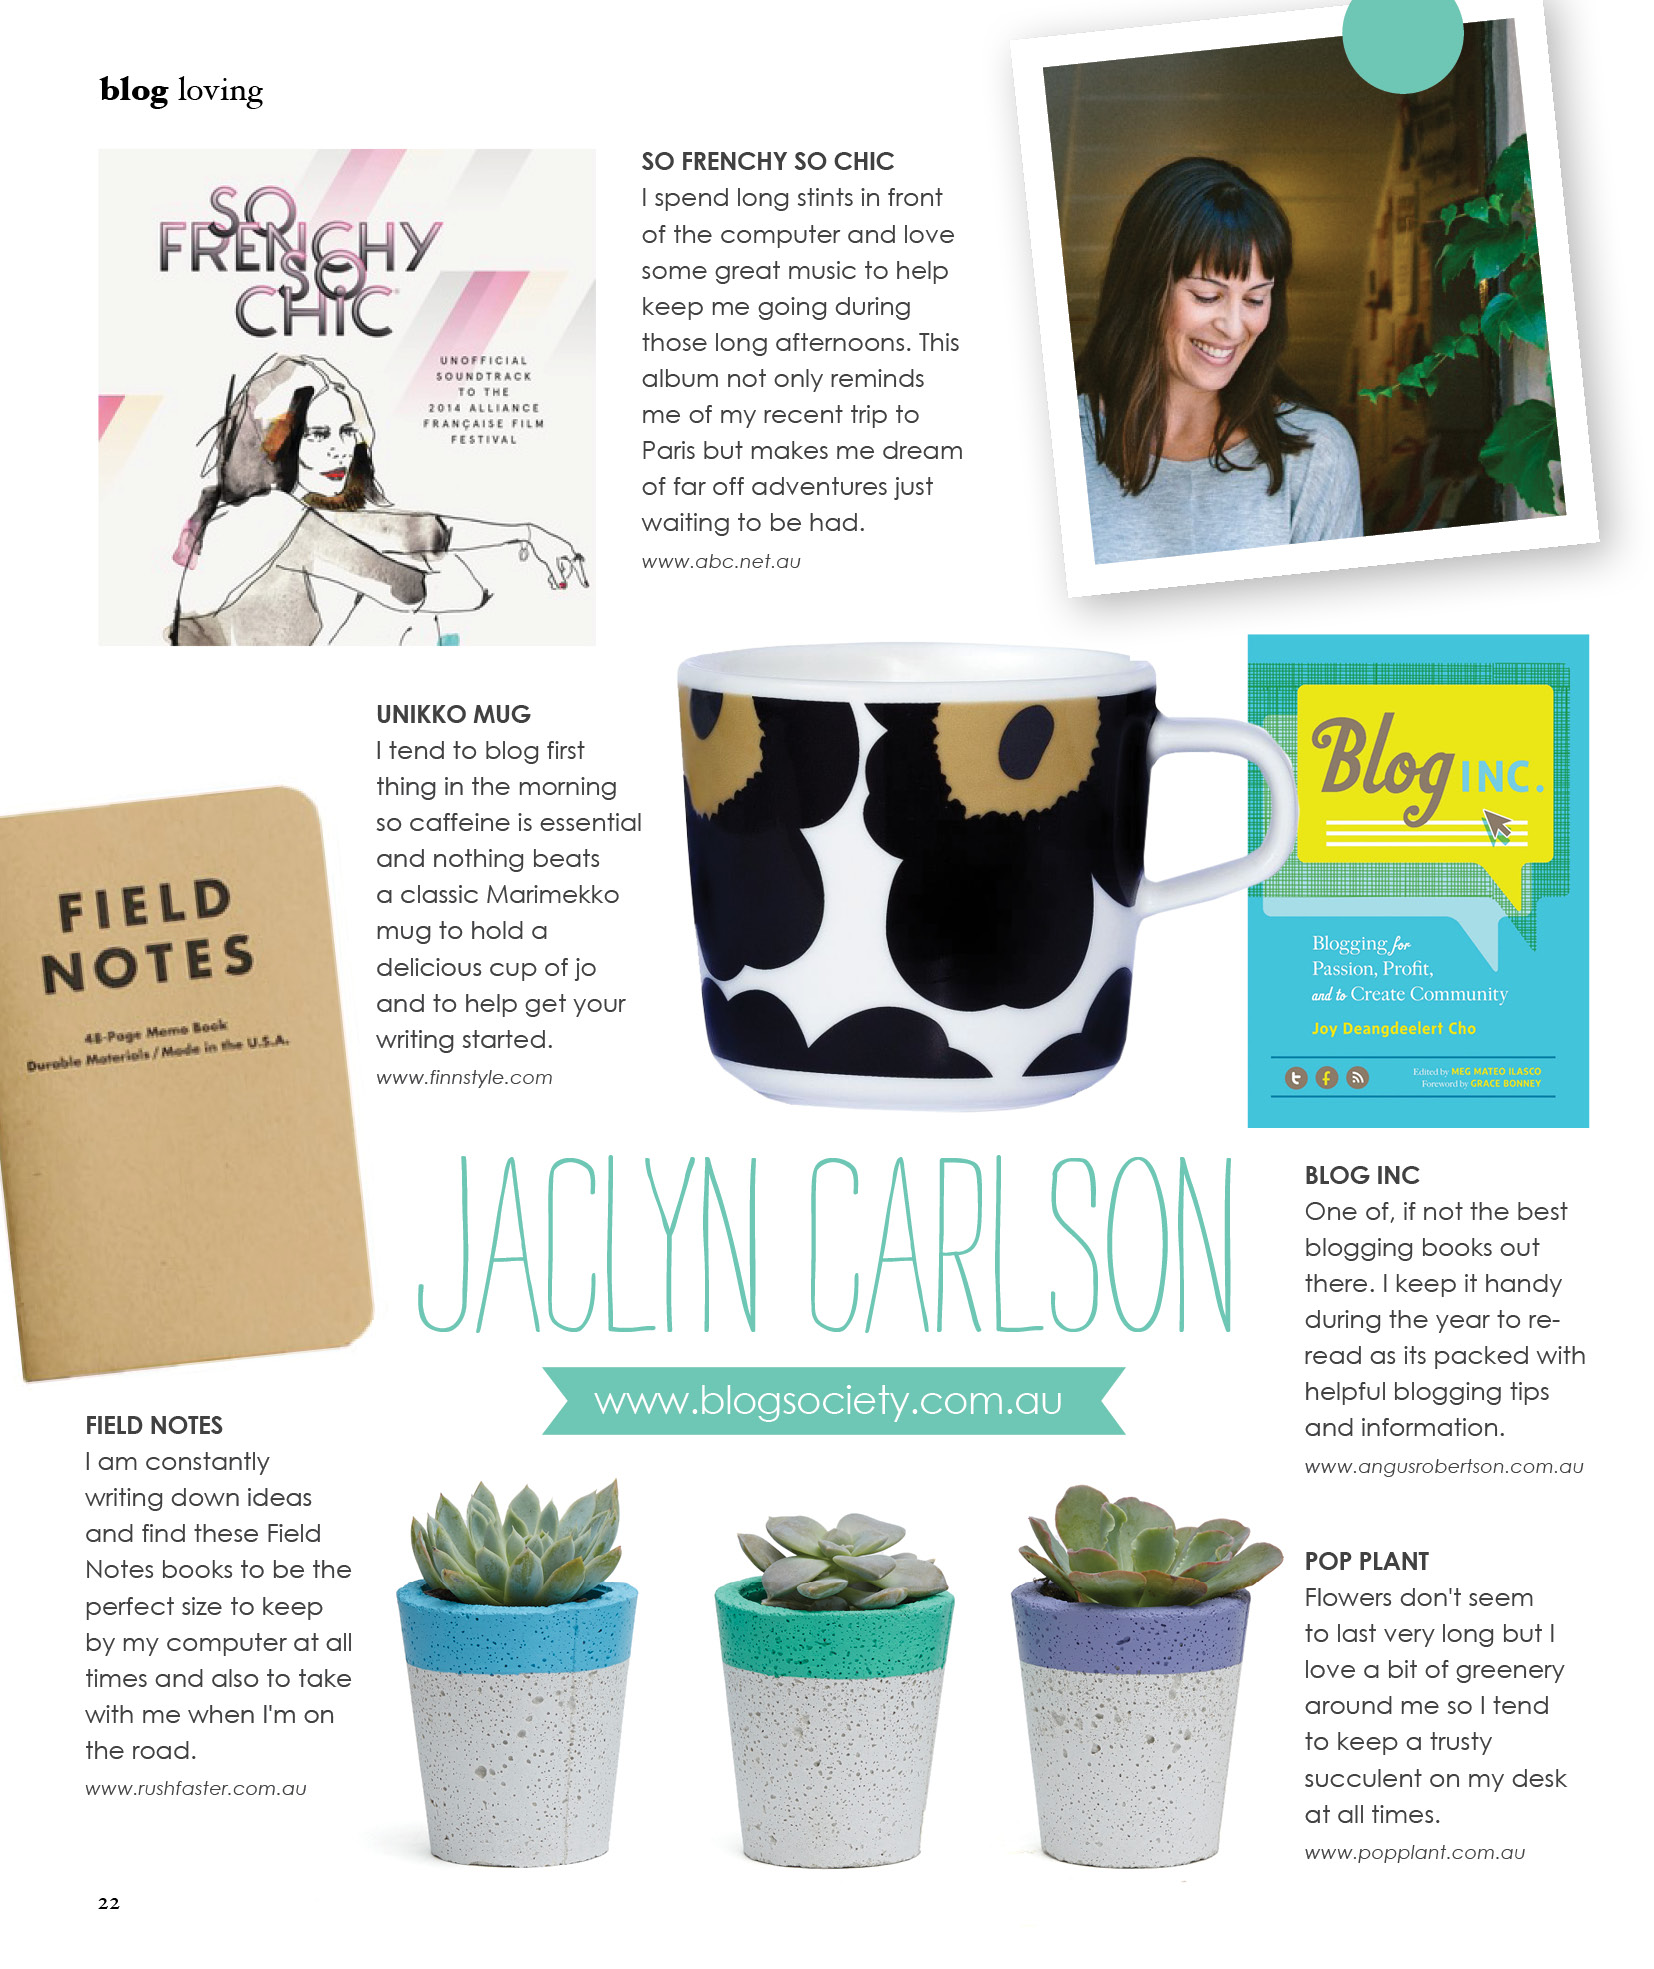 Jaclyn-Carlson.jpg